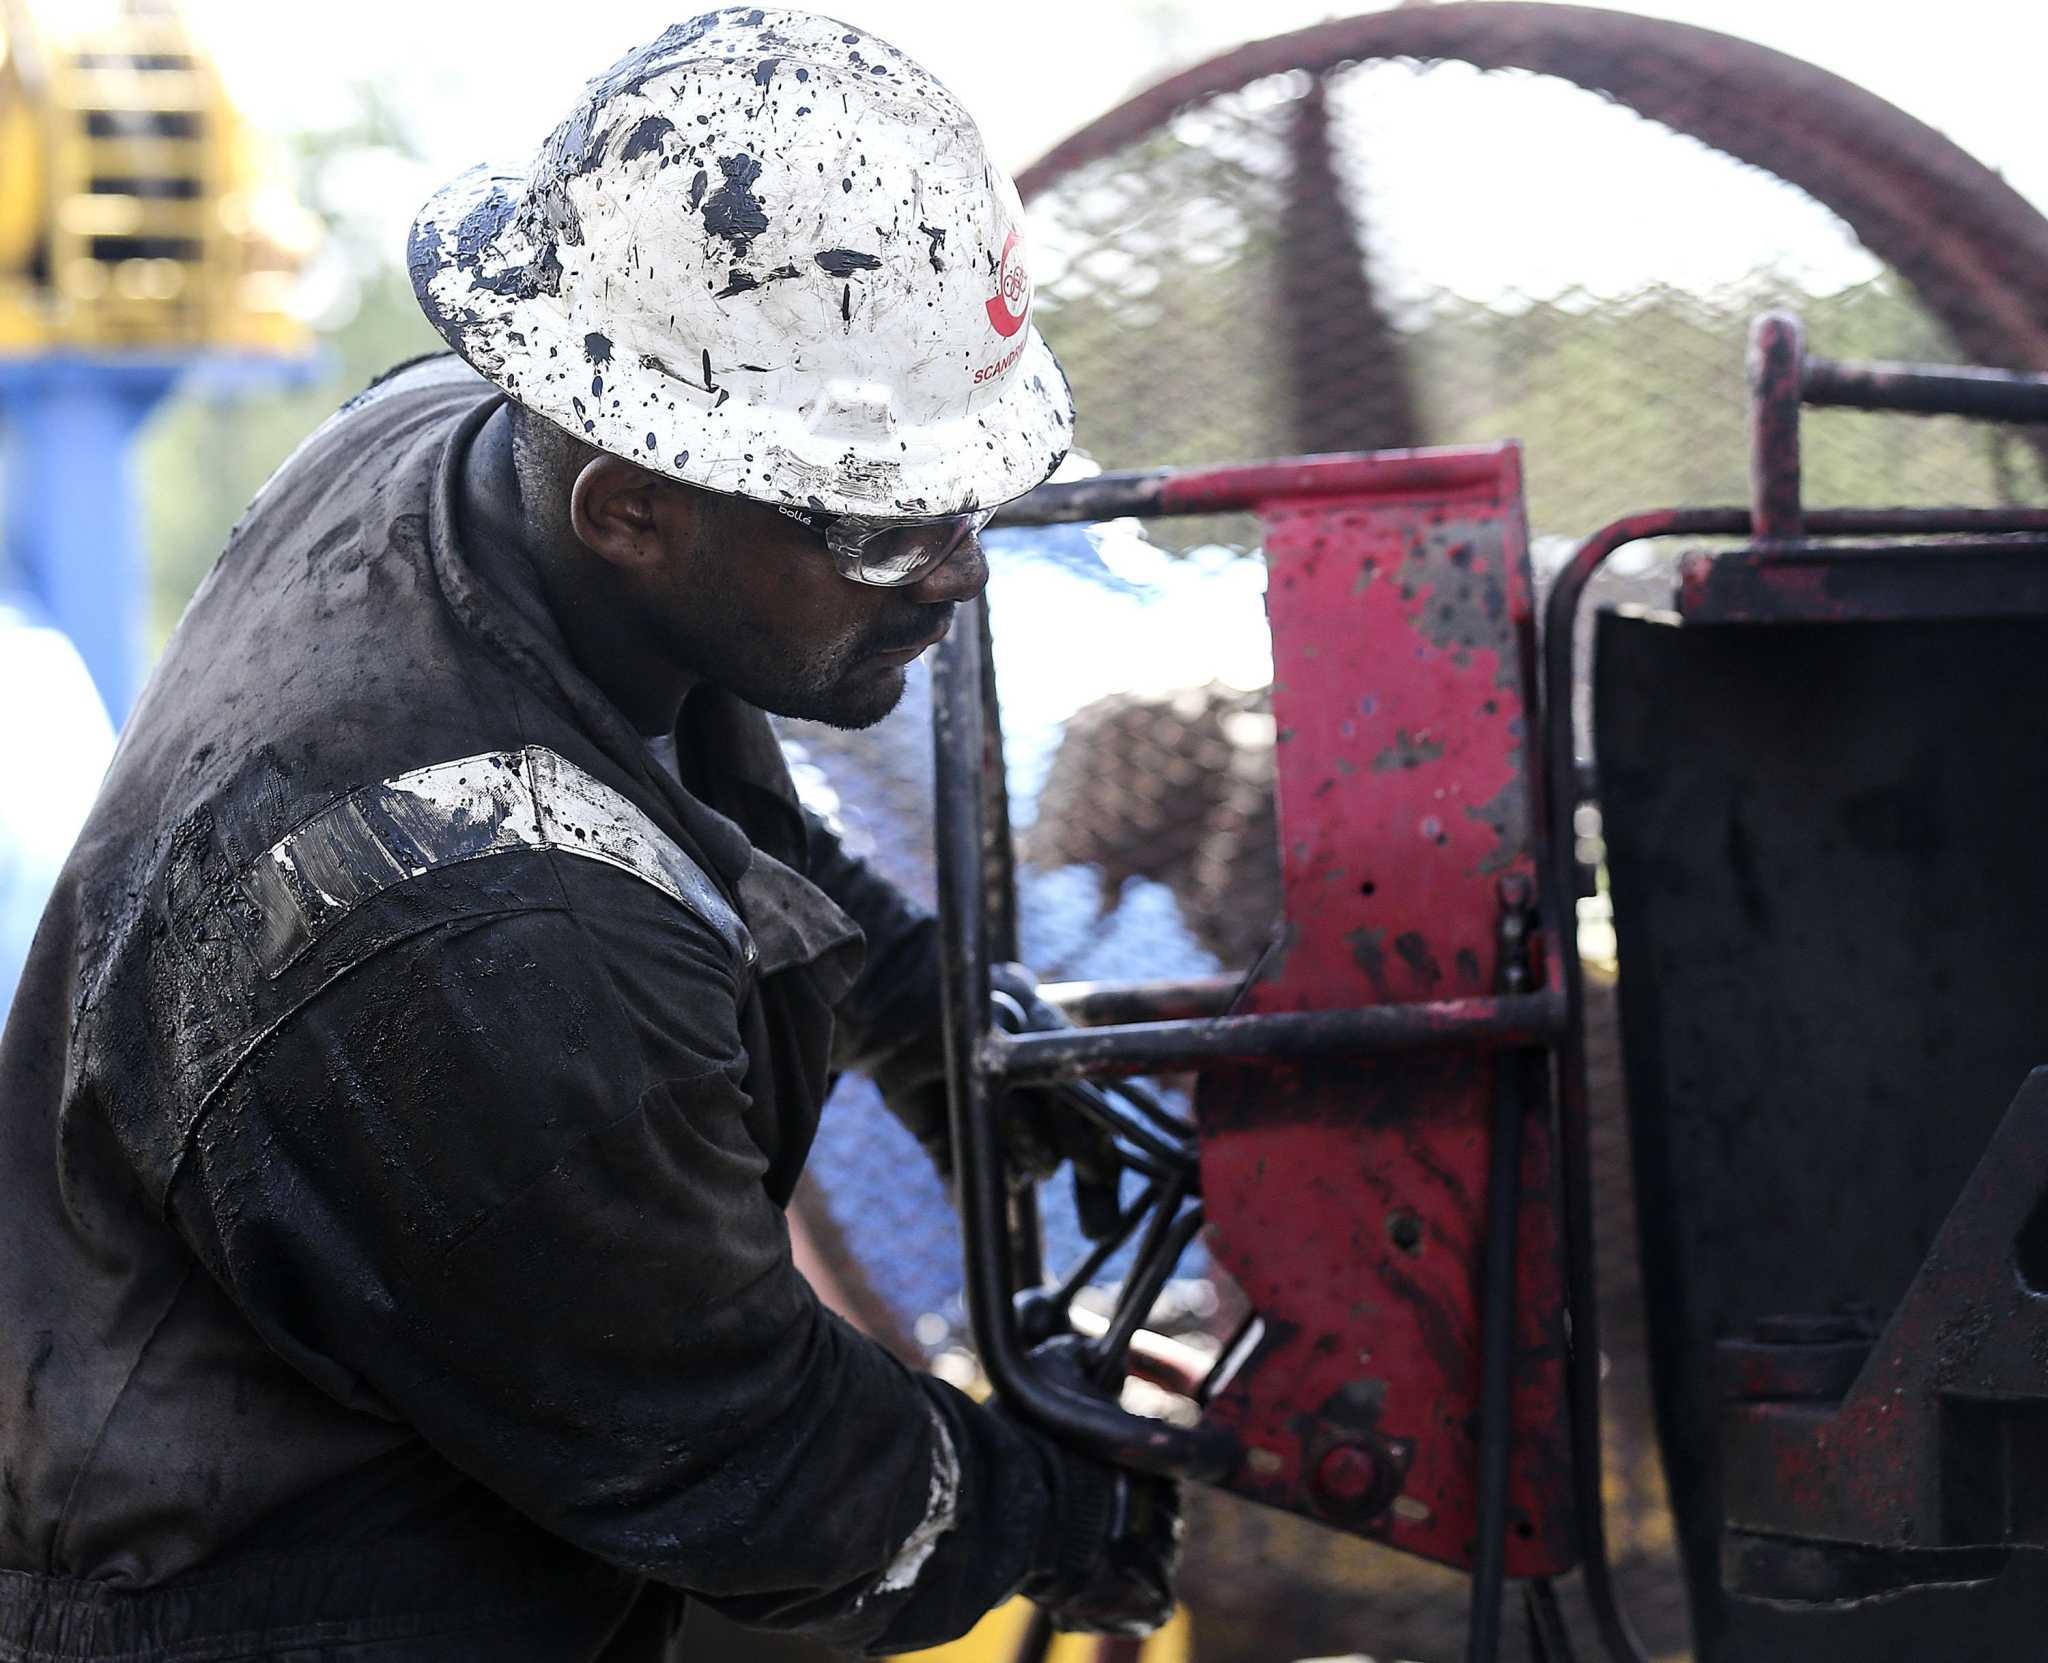 Haynesville Shale biggest loser in latest rig count